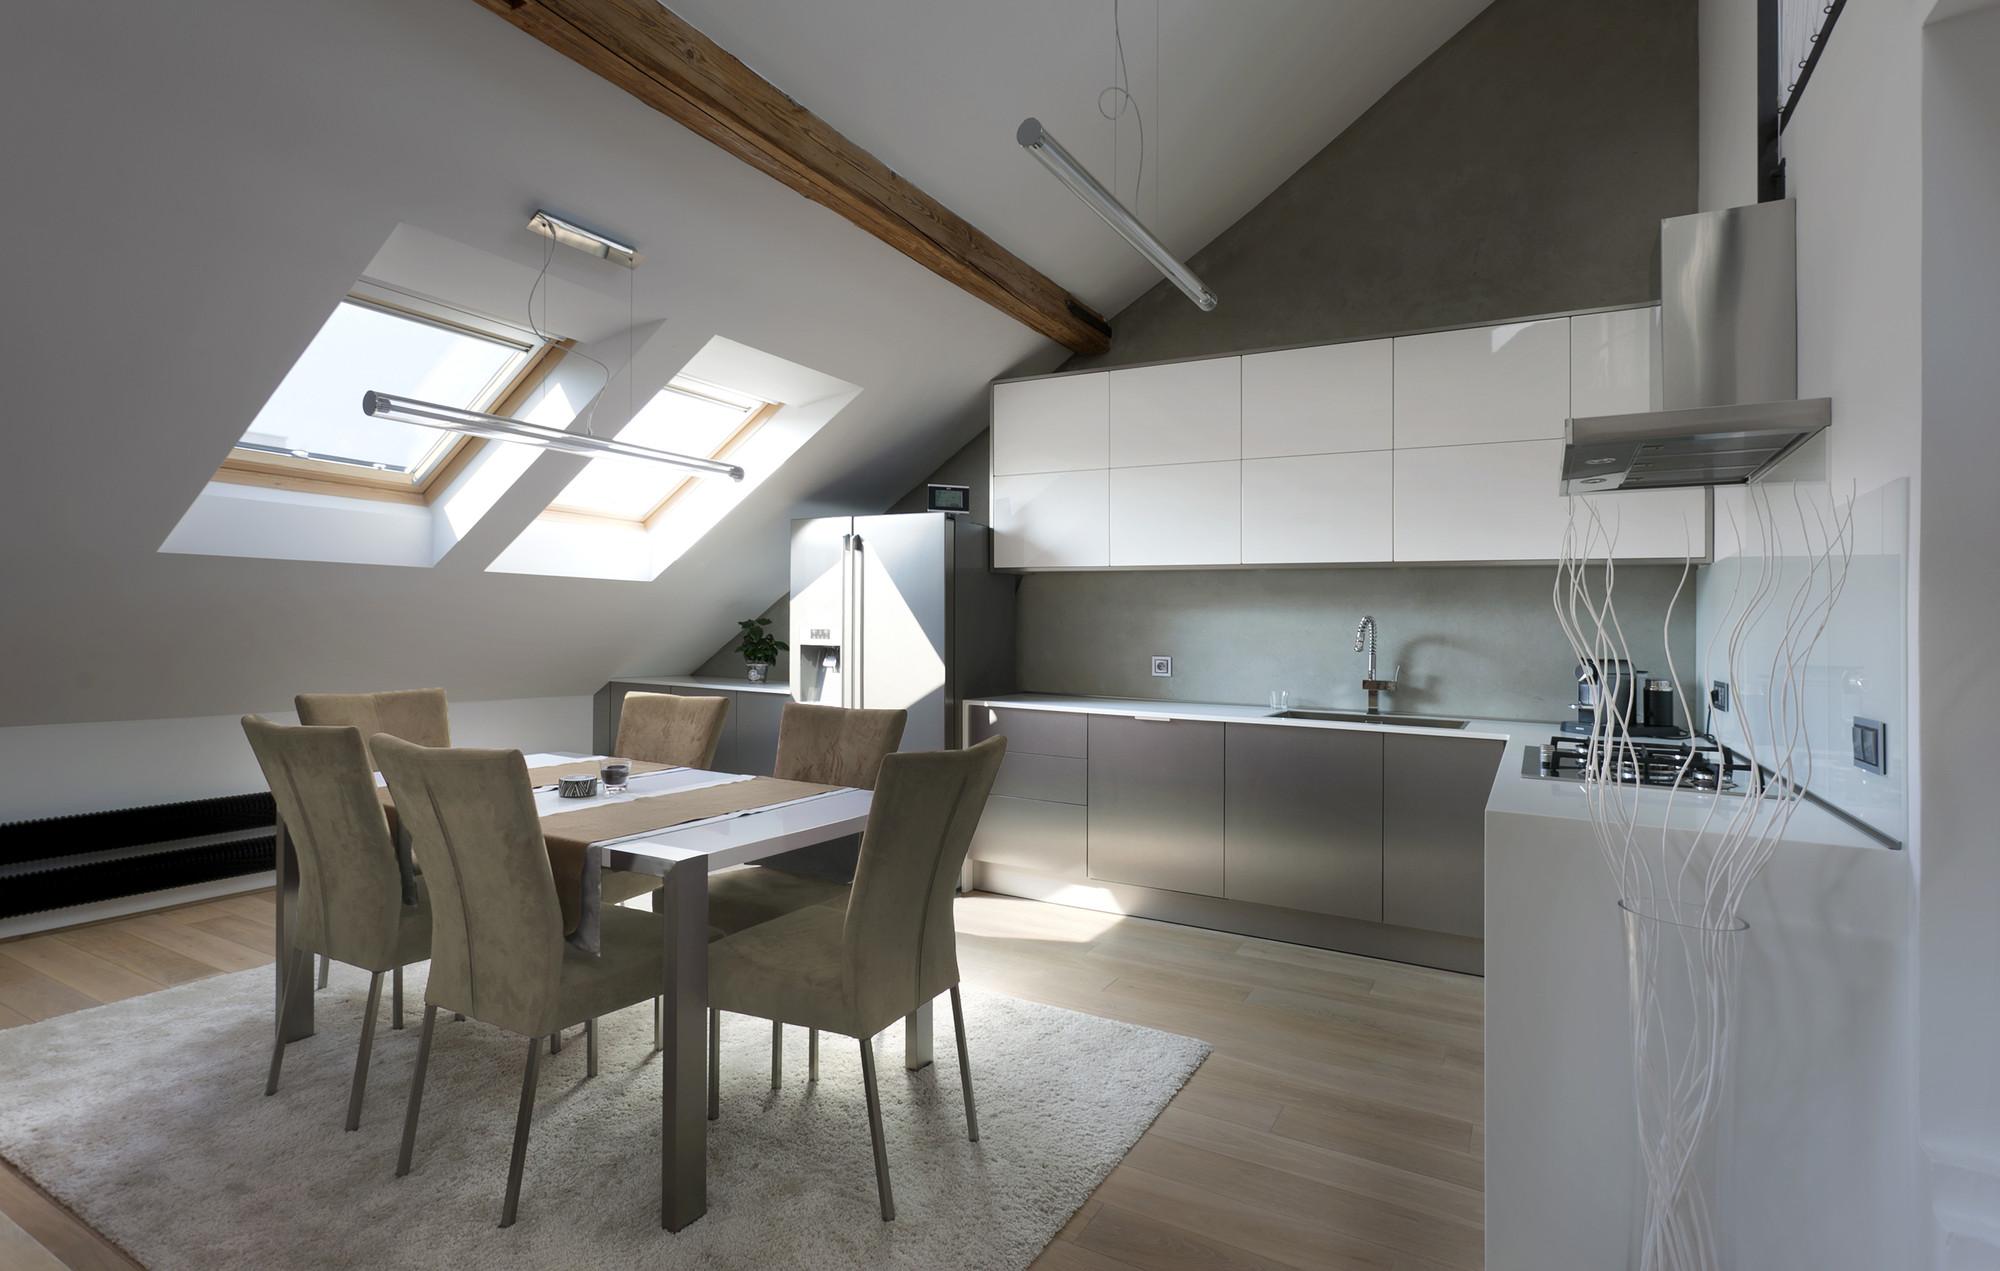 Attic Loft gallery of attic loft reconstruction / b² architecture - 1